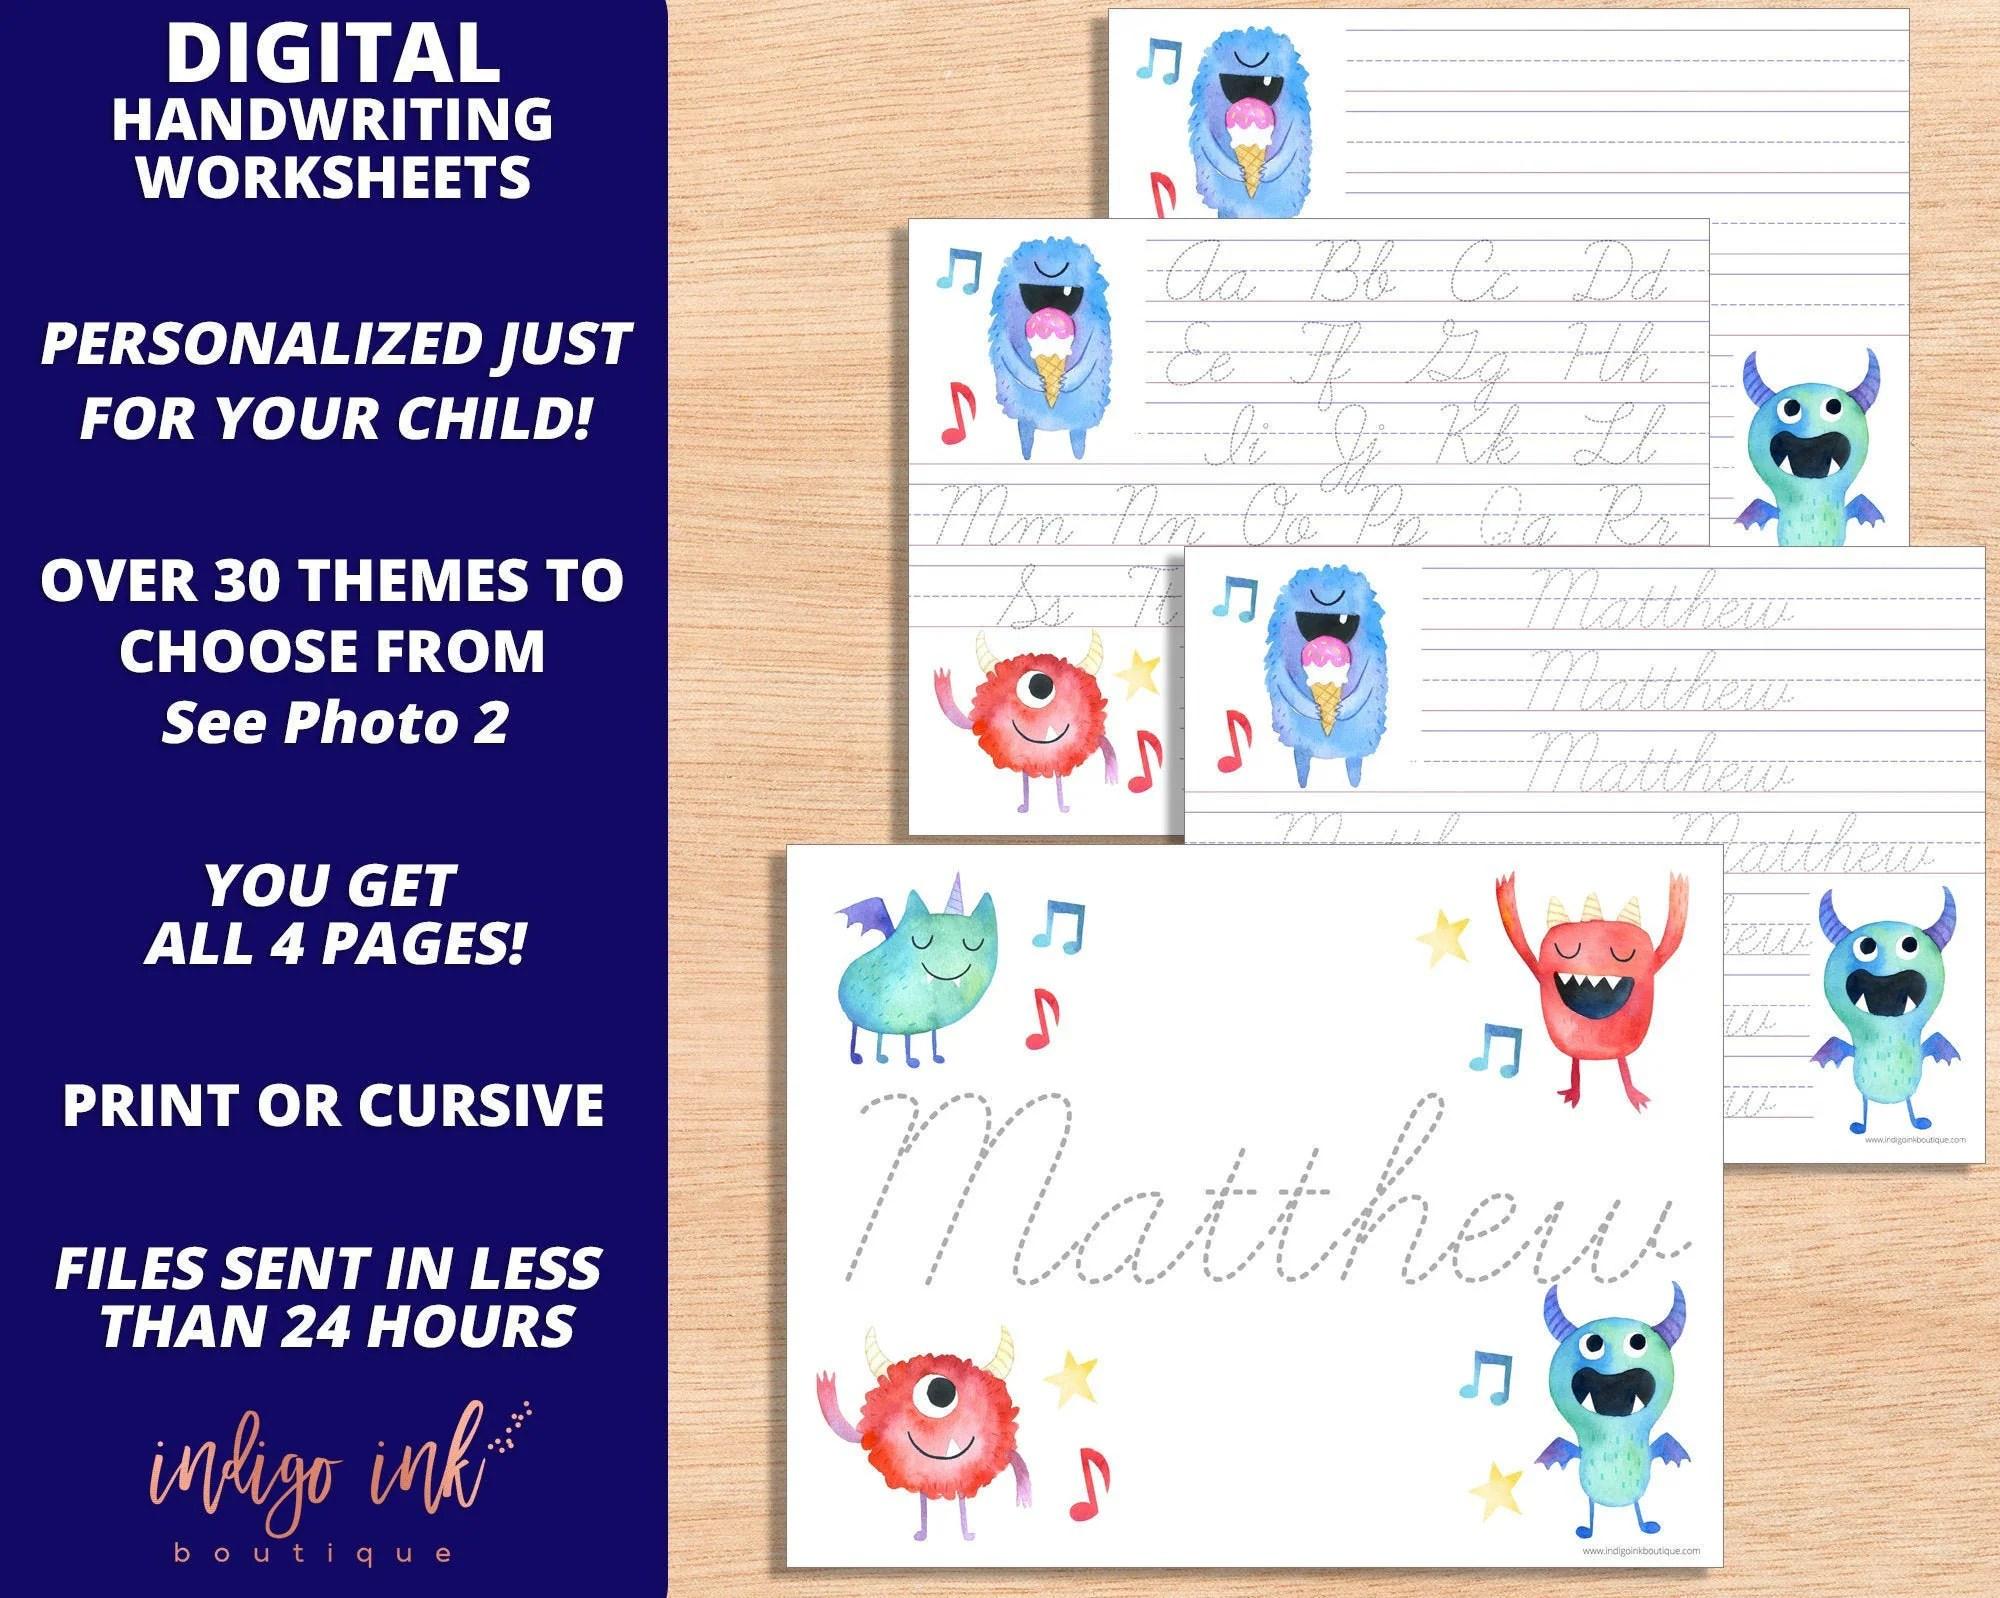 Personalized Handwriting Worksheet Digital Download 1st